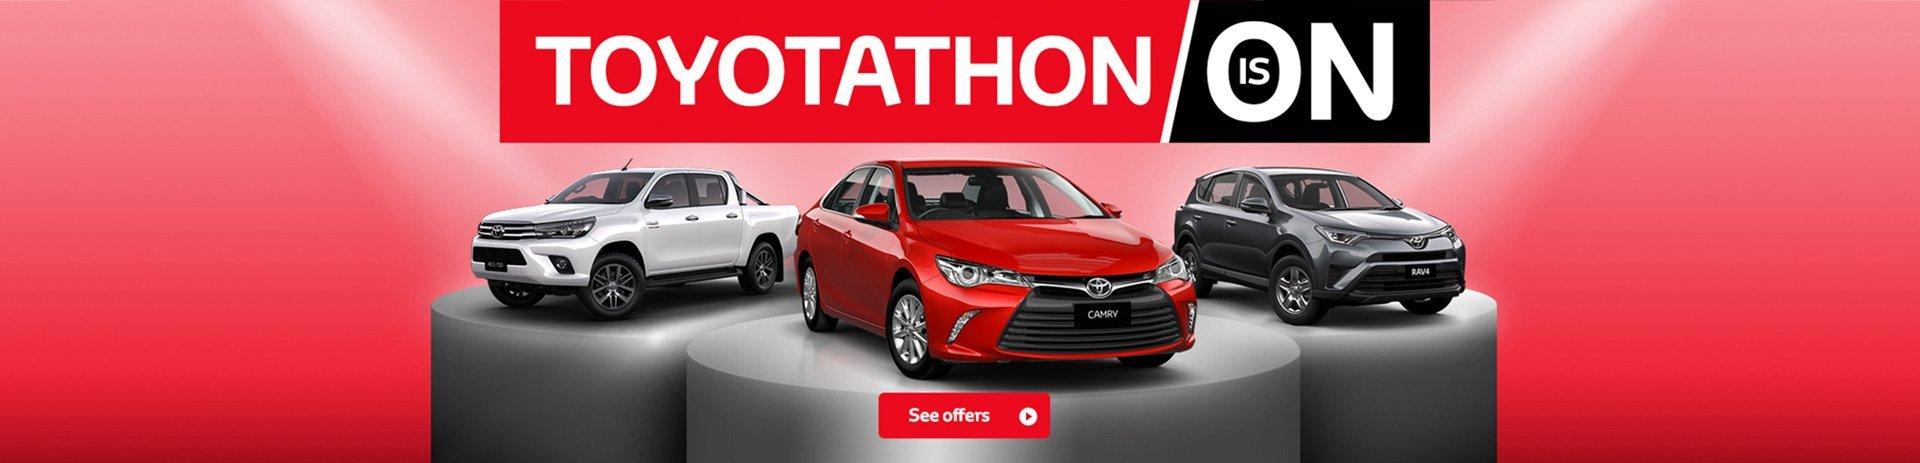 Toyota - National Offer - Toyotathon...